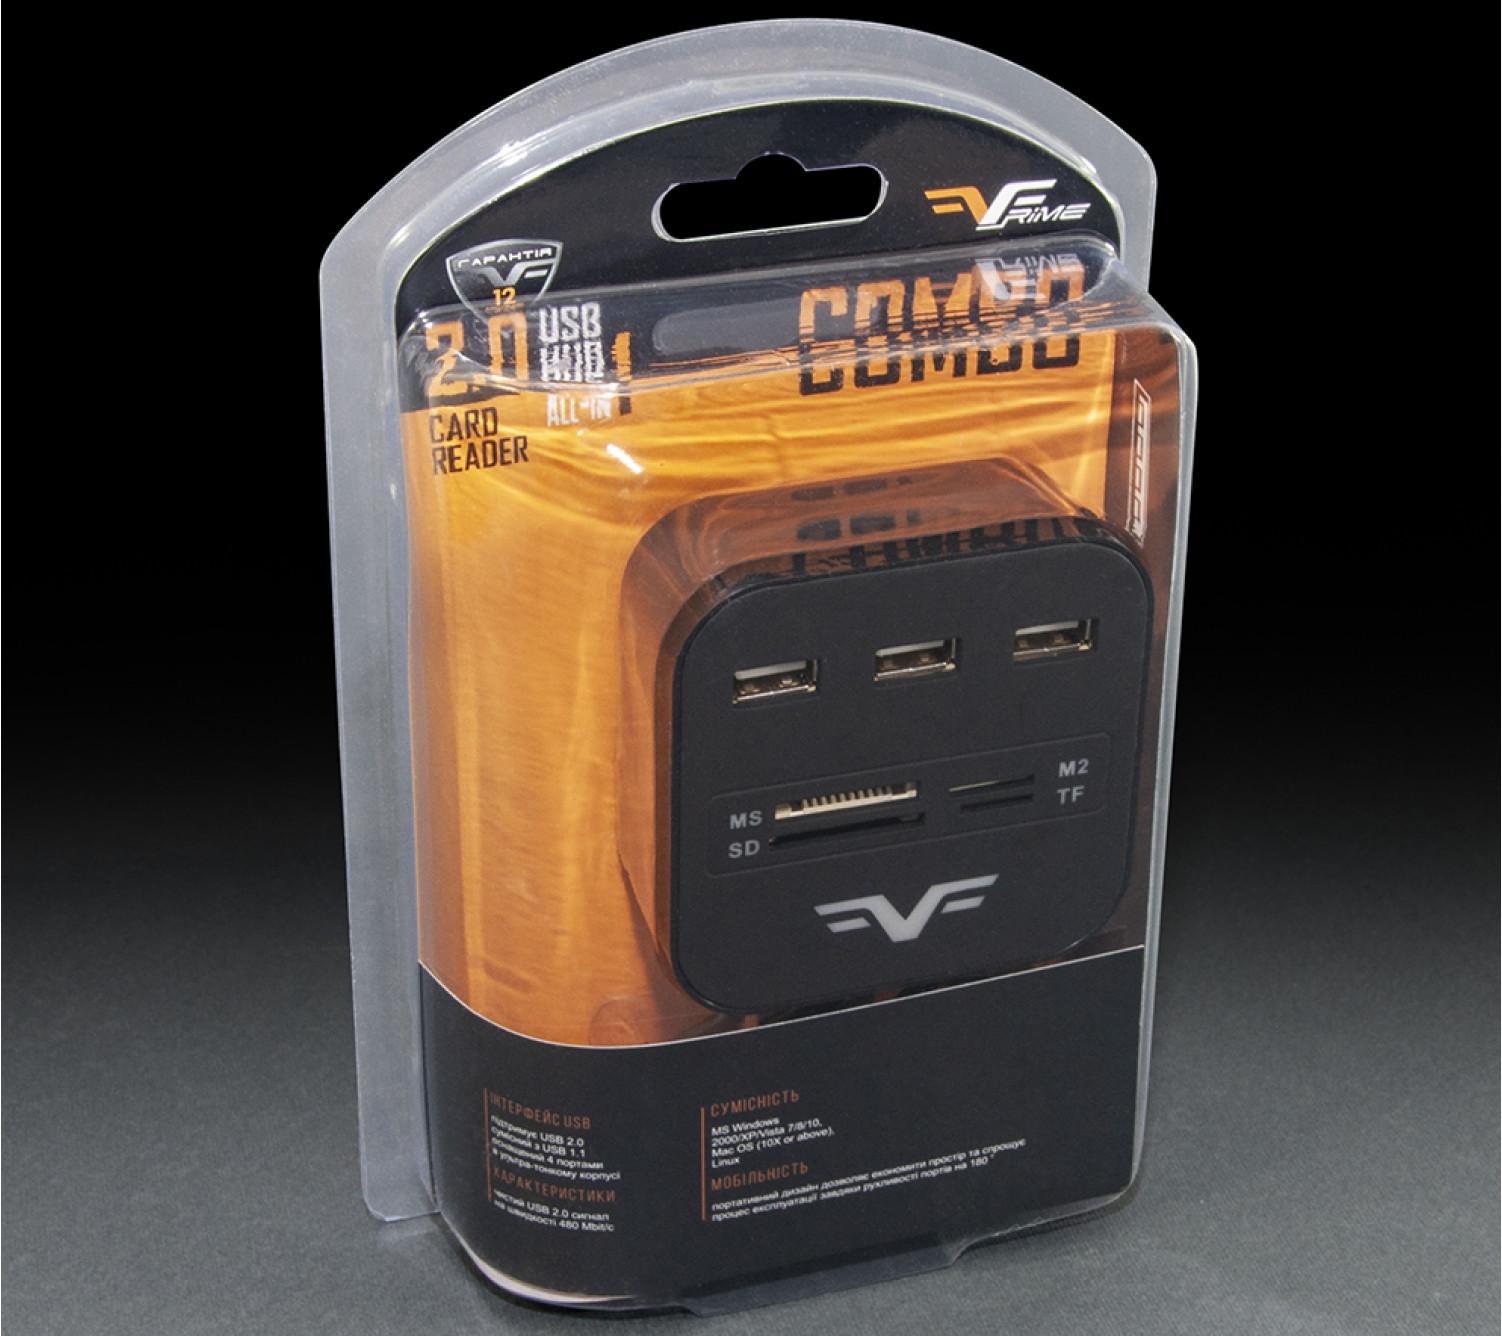 3-х портовый USB-хаб Frime с картридером All-in-One Black (FHC-AllinOne3p2B)